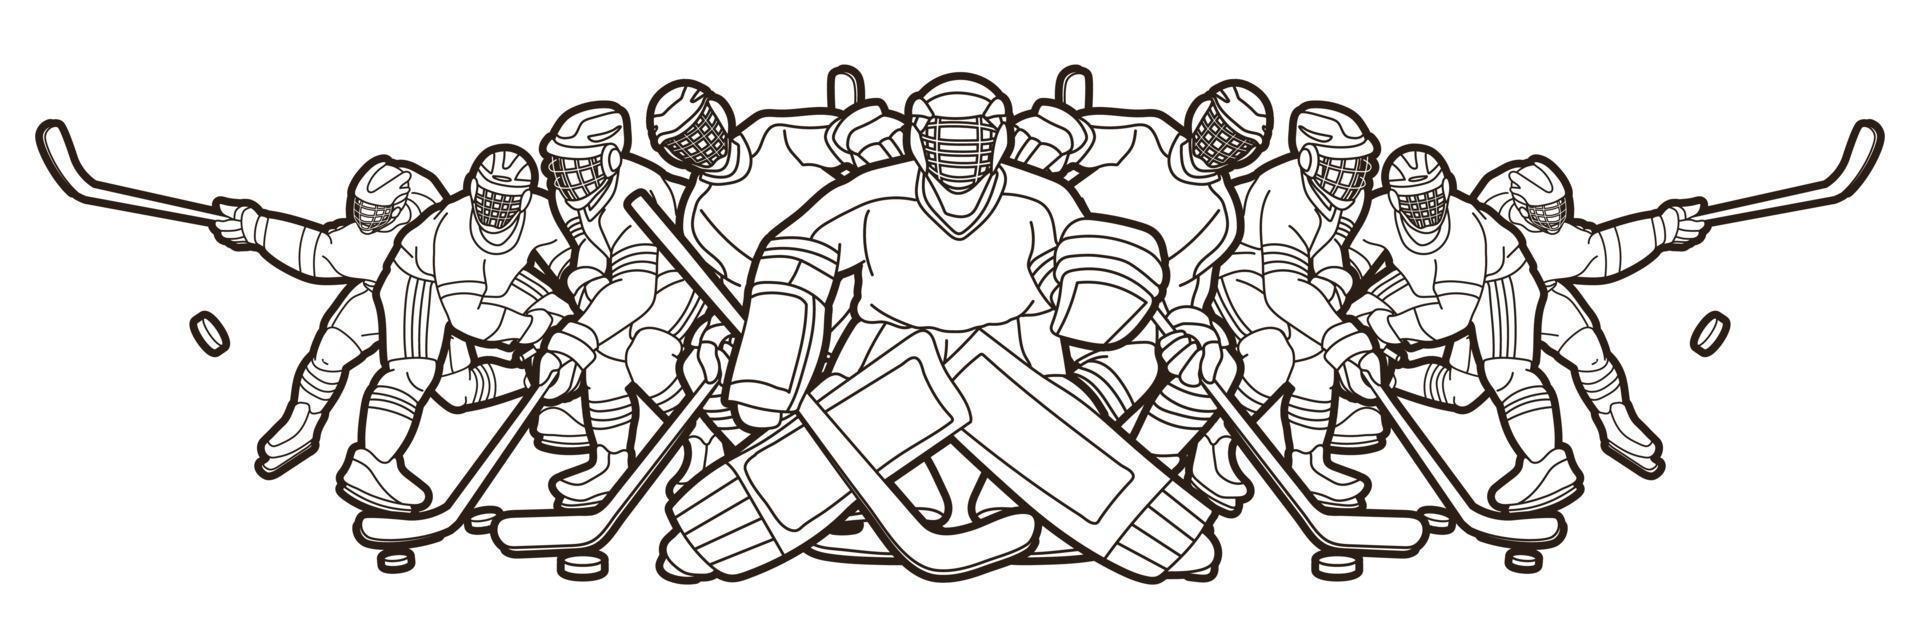 Ice Hockey Men Players Team Outline vector